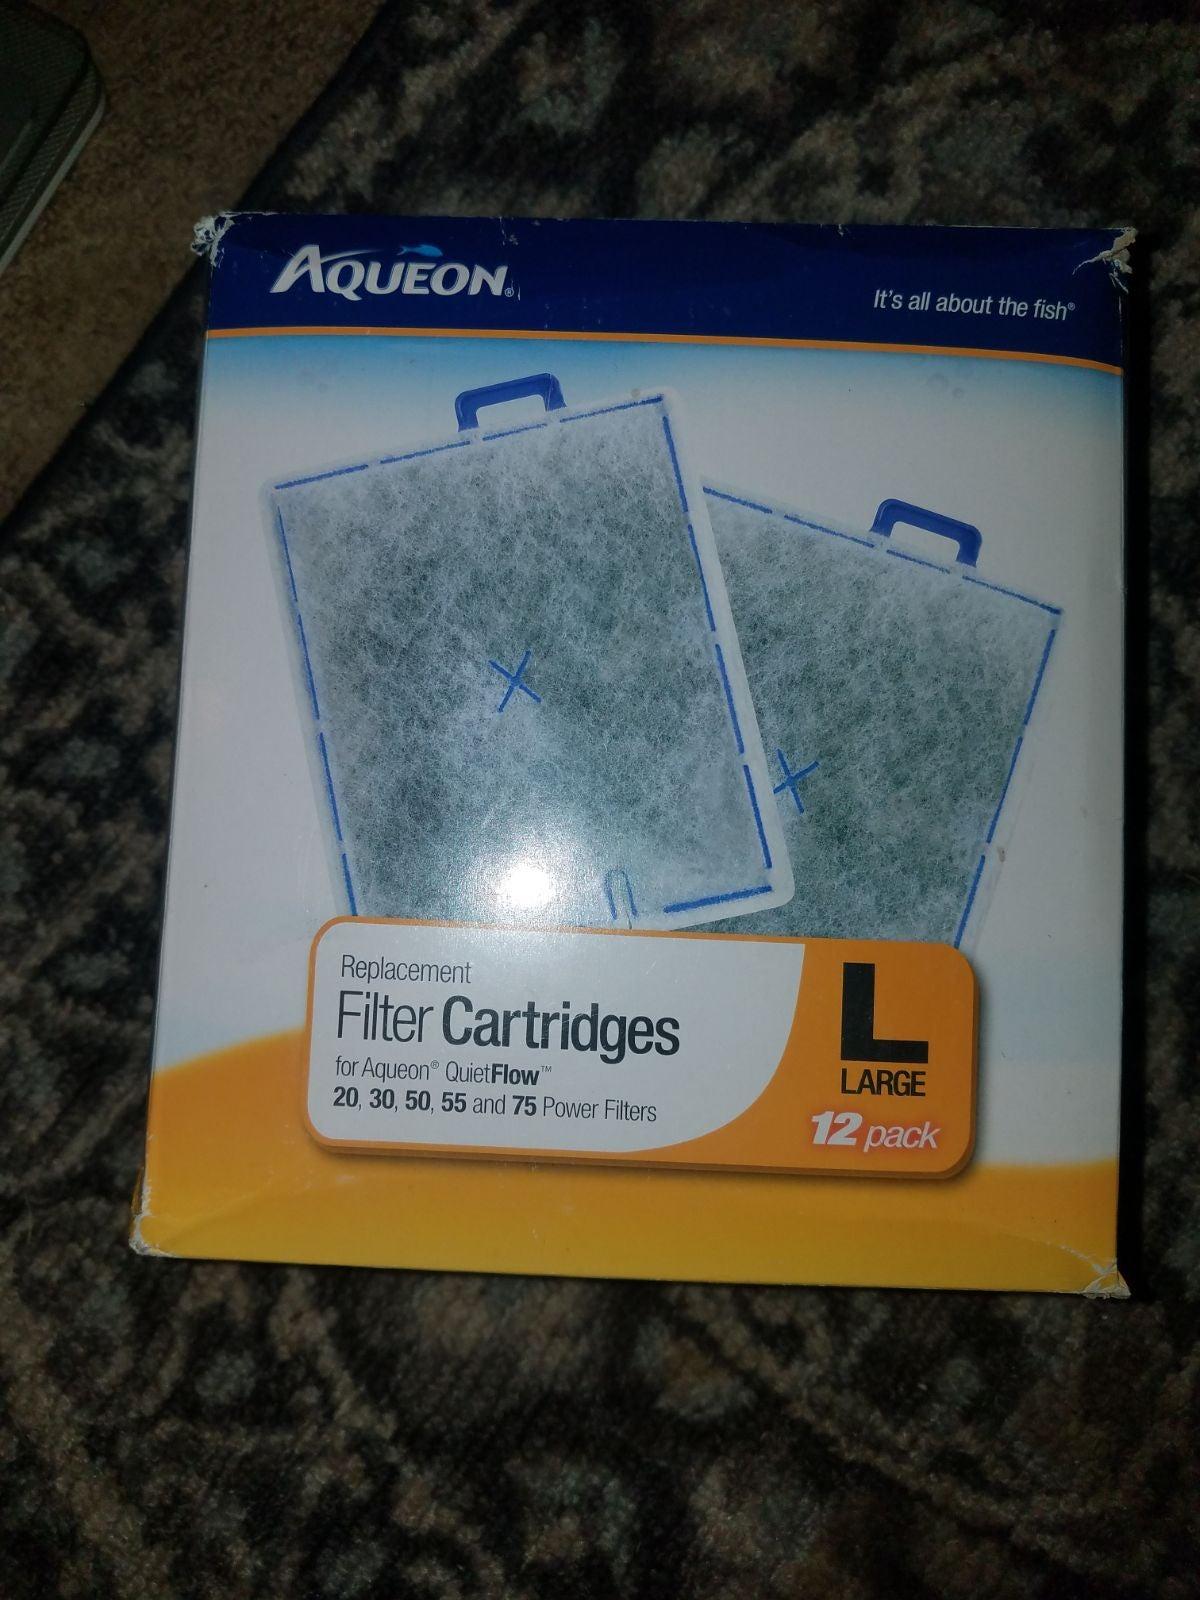 Aqueon Replacement Filter Cartridges 10